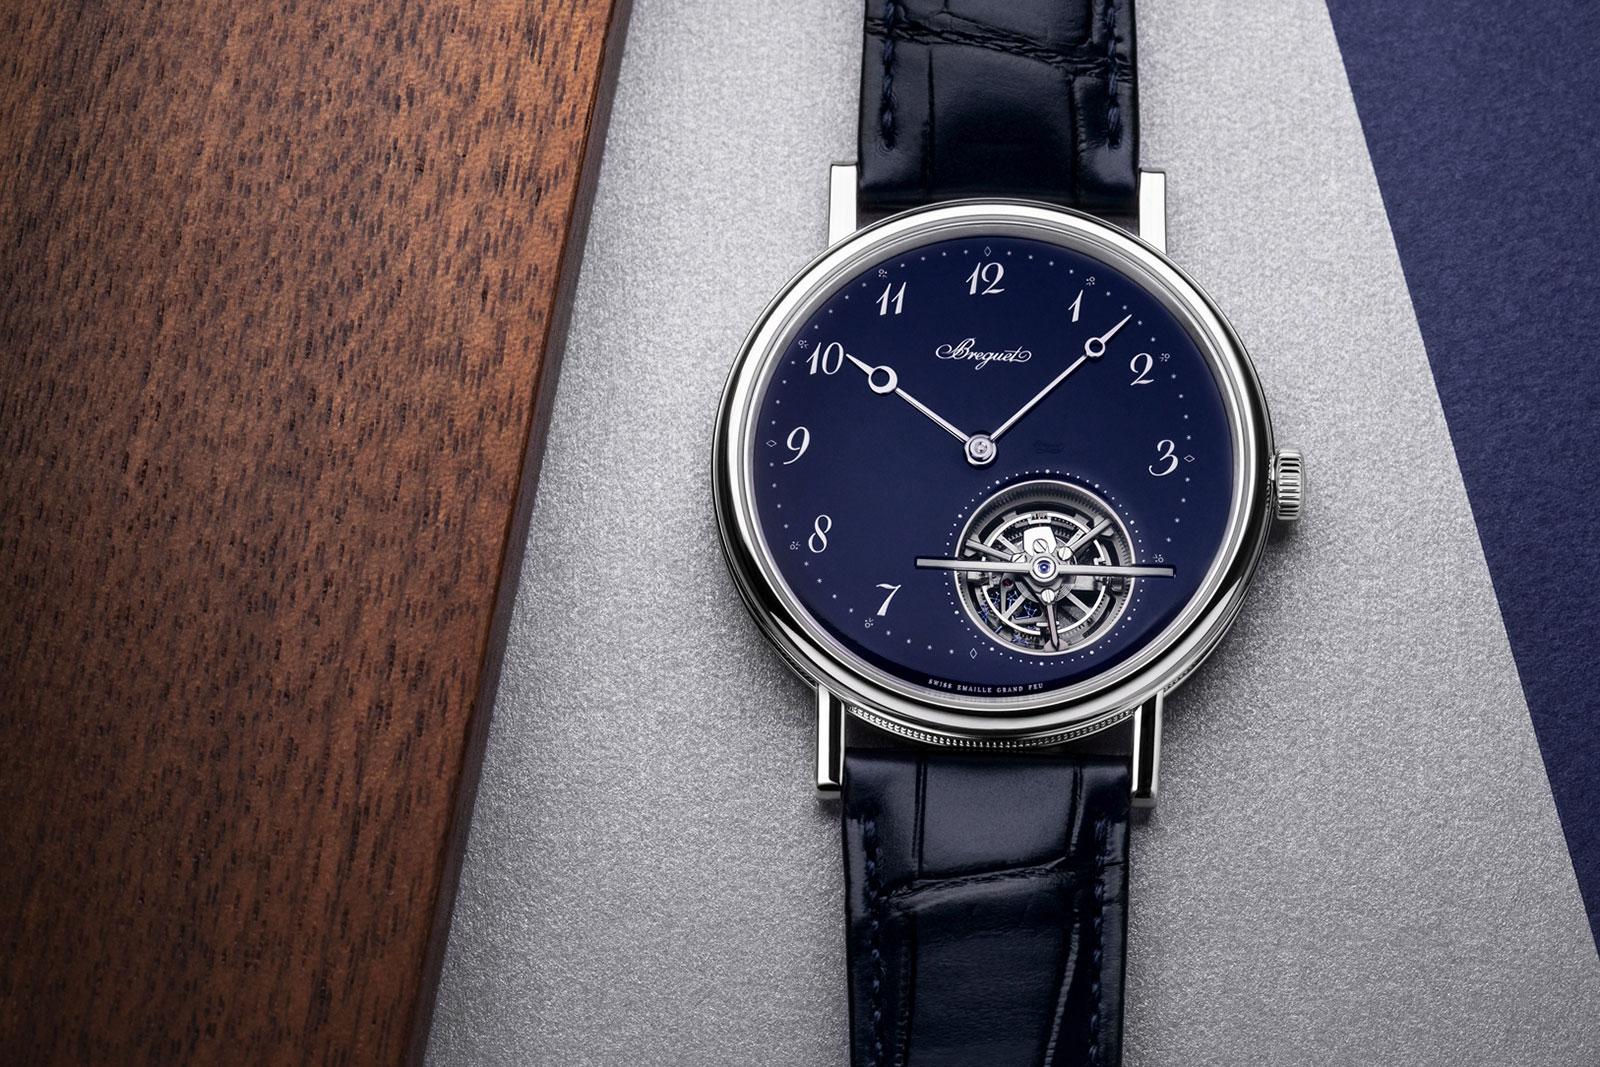 Breguet Introduces the Classique Tourbillon Extra-Plat 5367 Blue Enamel | SJX Watches